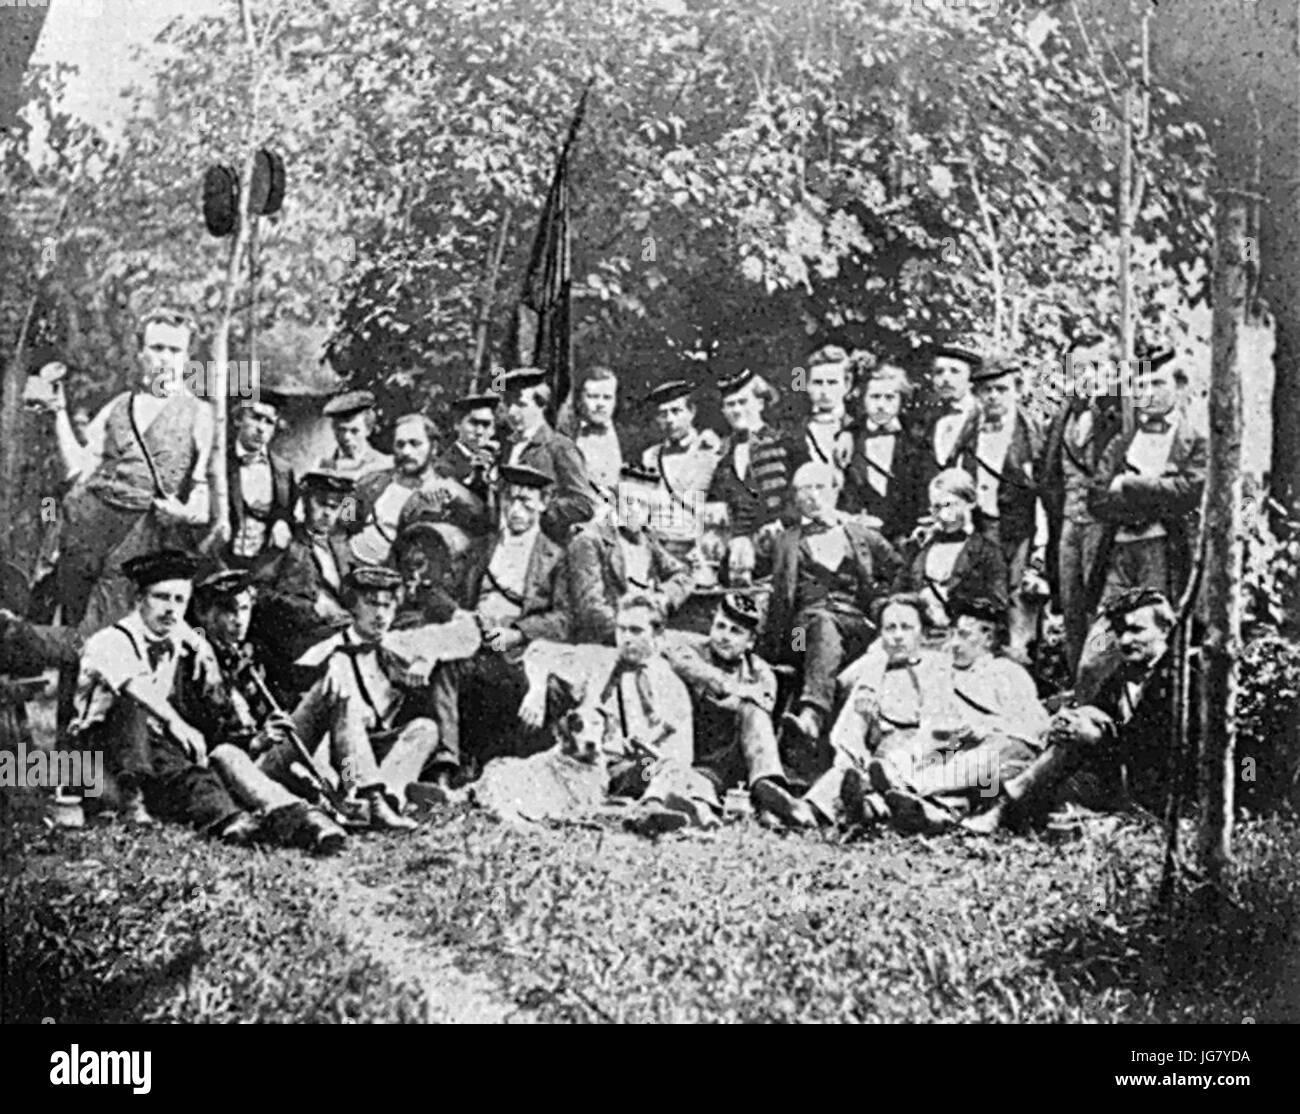 Unbekannter Fotograf Die Tübinger Königsgesellschaft Roigel im Kurzischen Garten  t Juny 1857 Salzpapierabzug Stock Photo